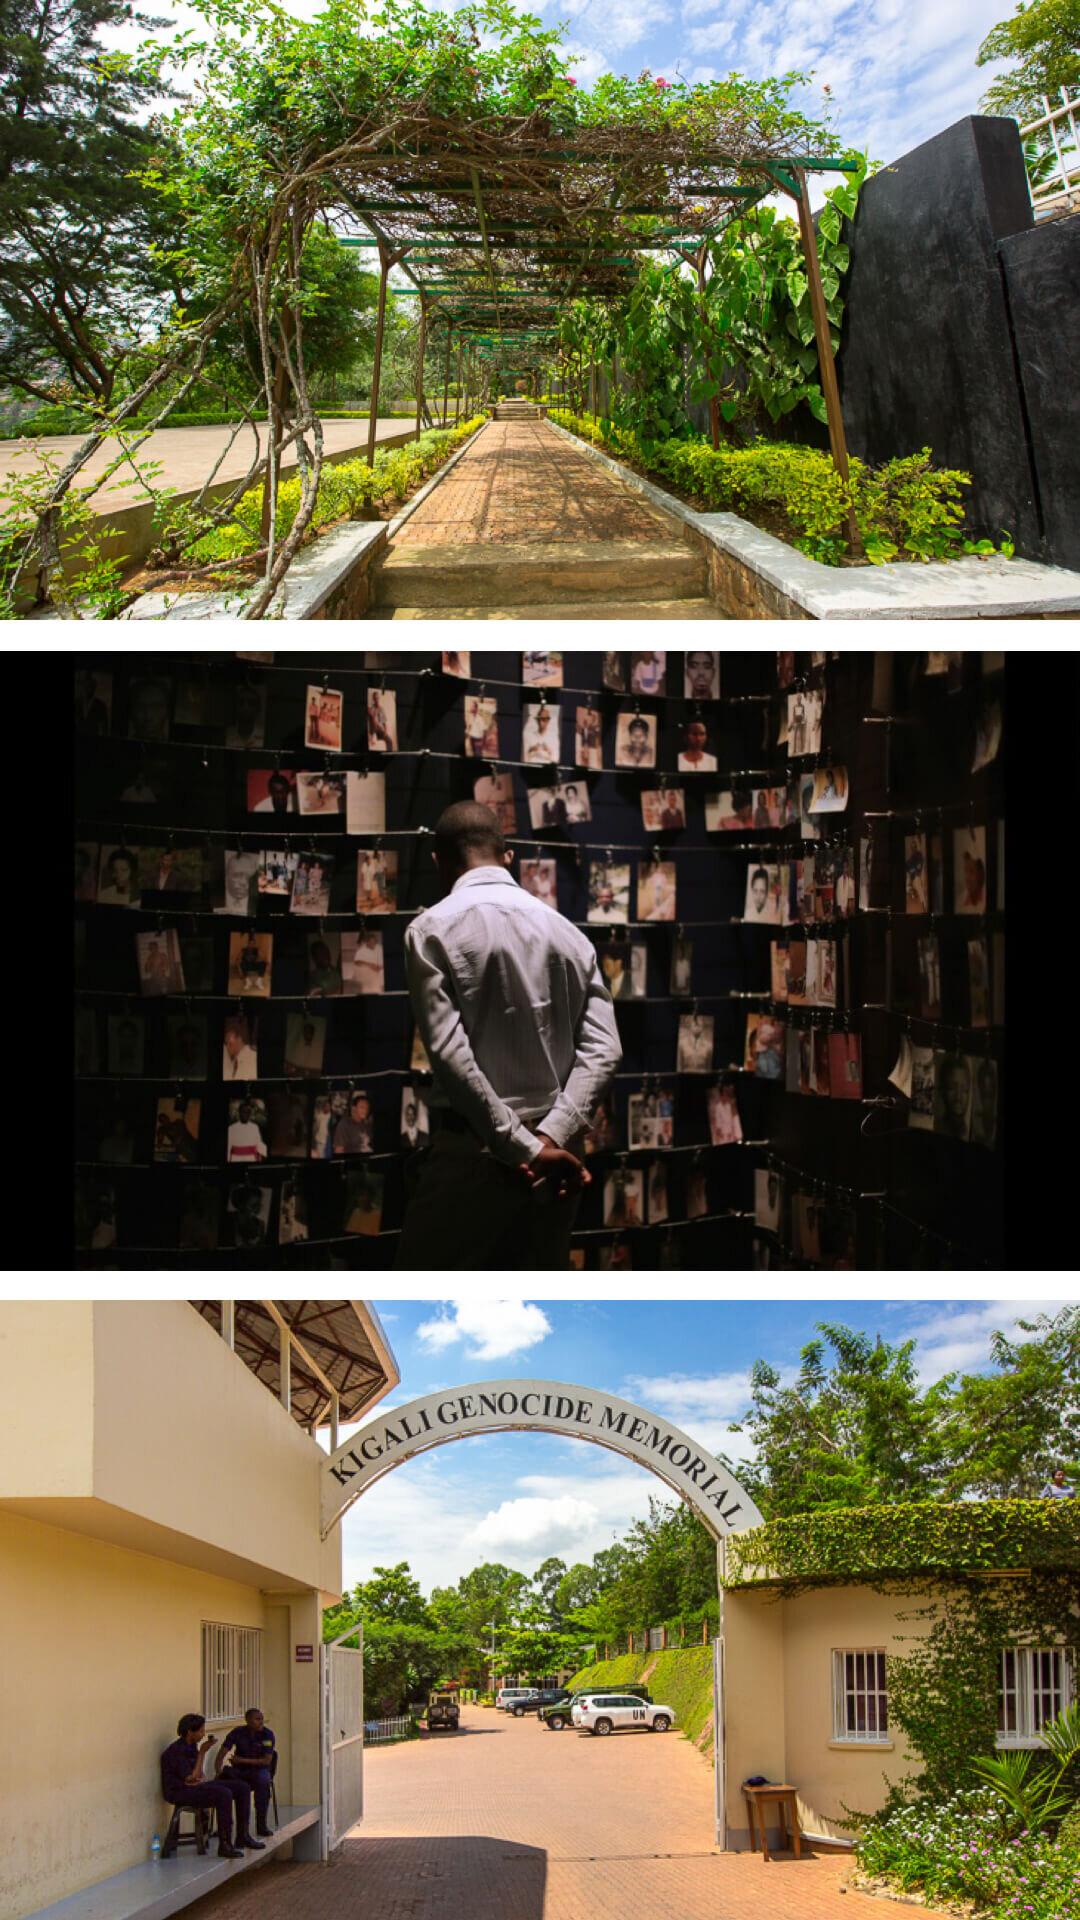 7.Visit the Kigali Genocide Memorial